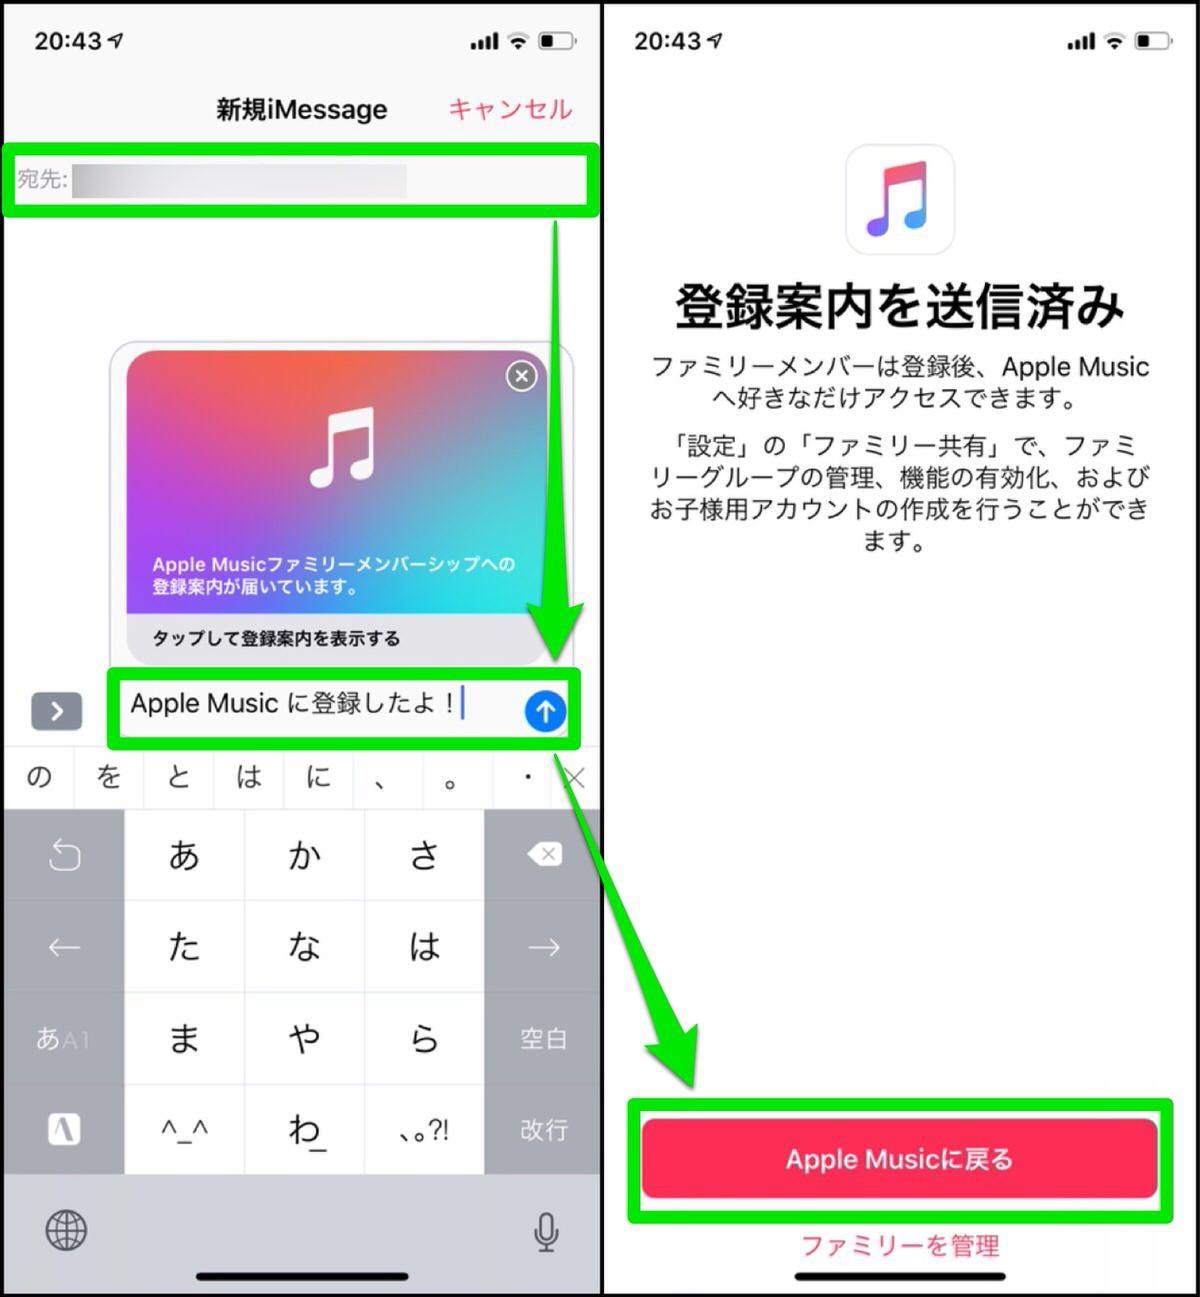 Apple Music-4